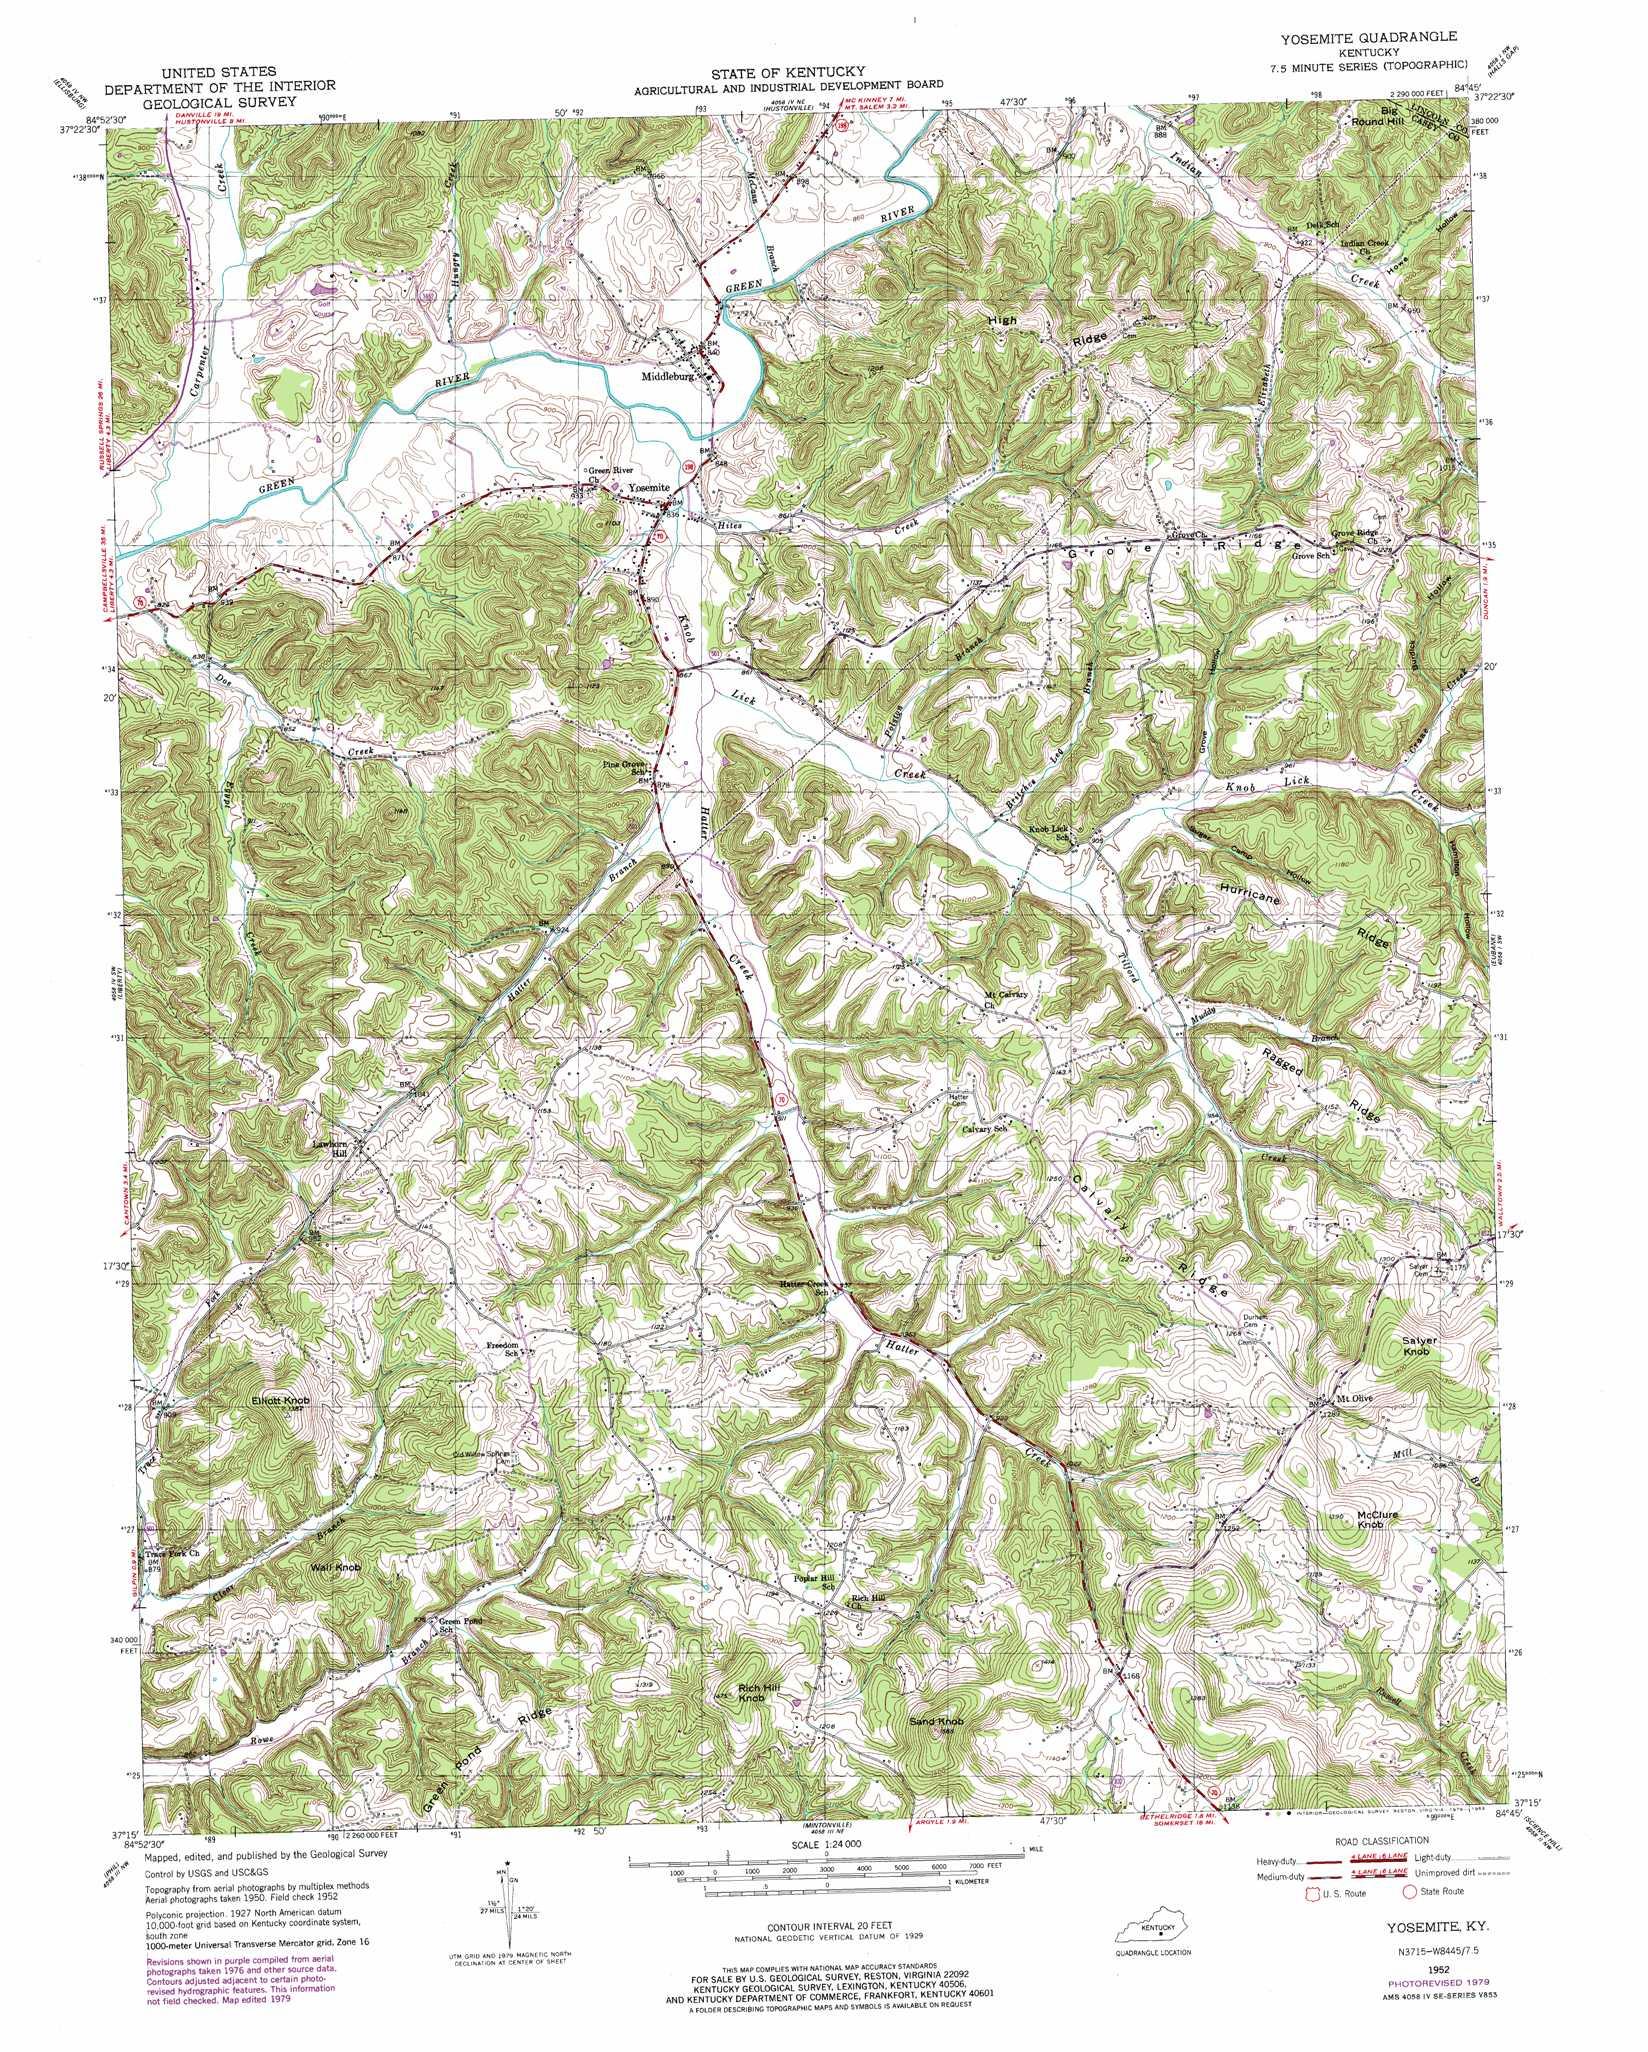 Yosemite topographic map, KY - USGS Topo Quad 37084c7 on yosemite area map, yosemite trails map, yosemite wawona map, yosemite lost brother, tenaya yosemite topographic map, curry village yosemite map, yosemite wallpaper, yosemite region map, yosemite high sierra topographic map, yosemite backcountry map, yosemite campground map, yosemite wildfire, yosemite hotel map, yosemite on map, yosemite map california, yosemite falls map, yosemite valley map, yosemite road map, yosemite hiking trails, yosemite lodging map,